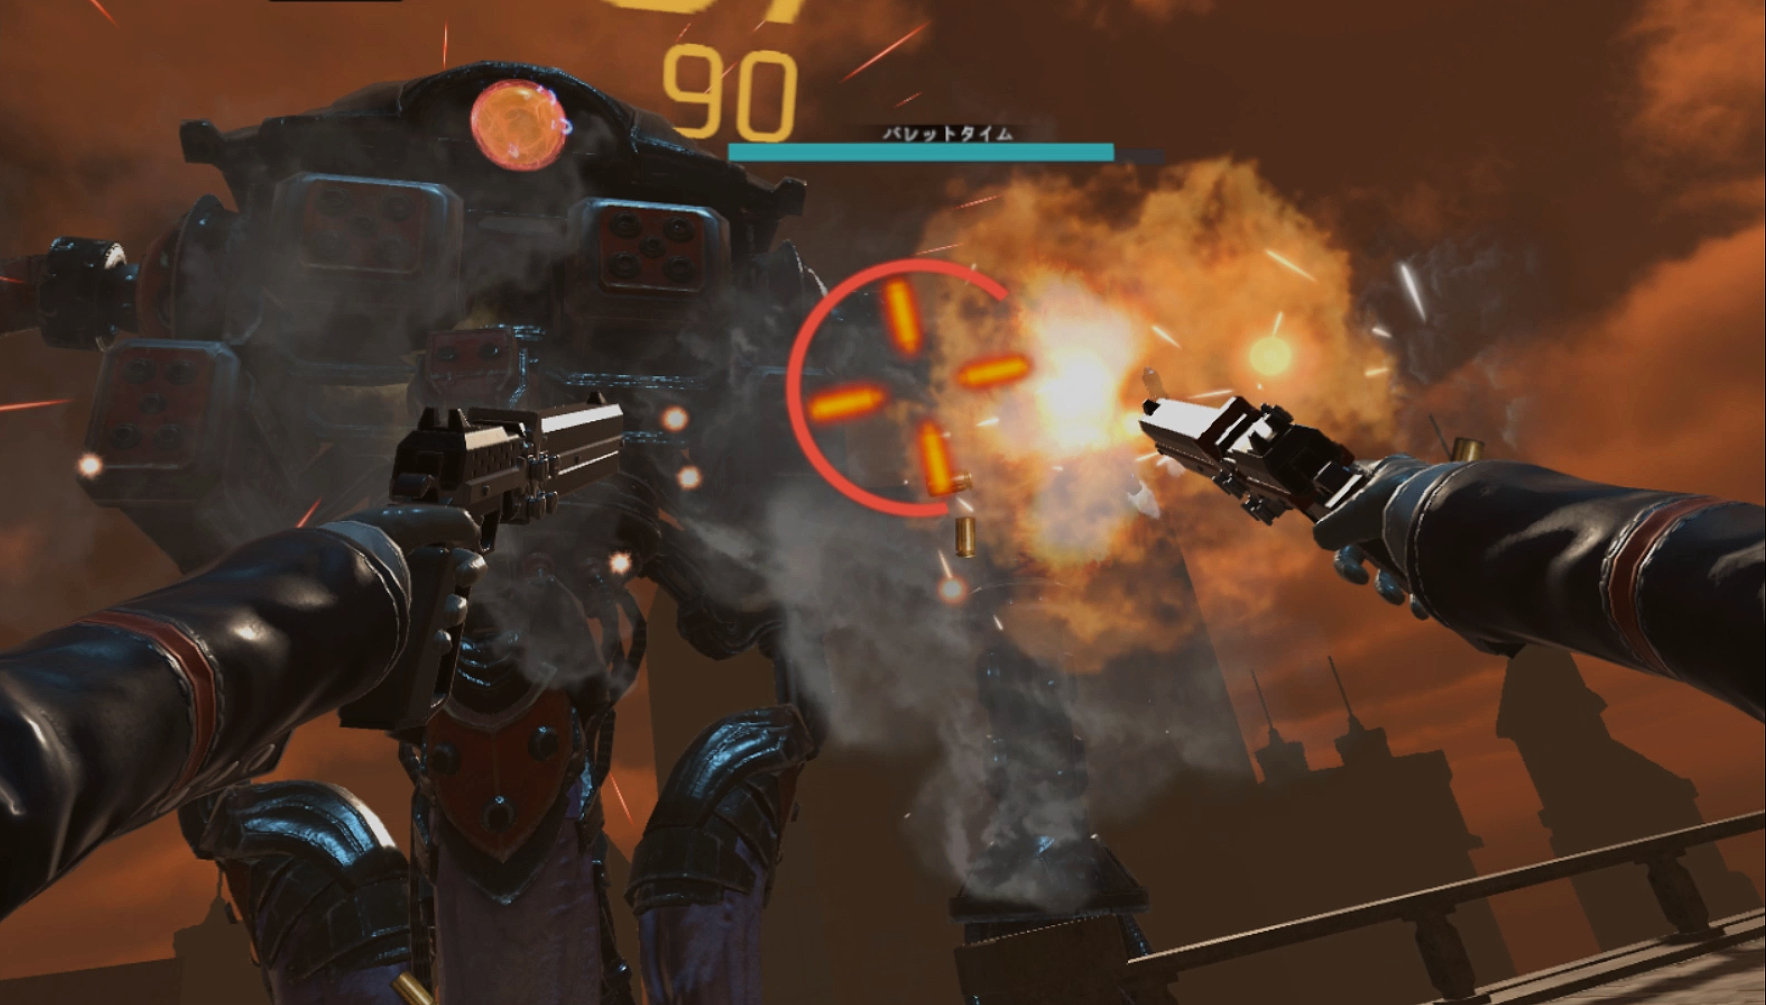 Gungrave-VR-PlayStation-VR-PSVR